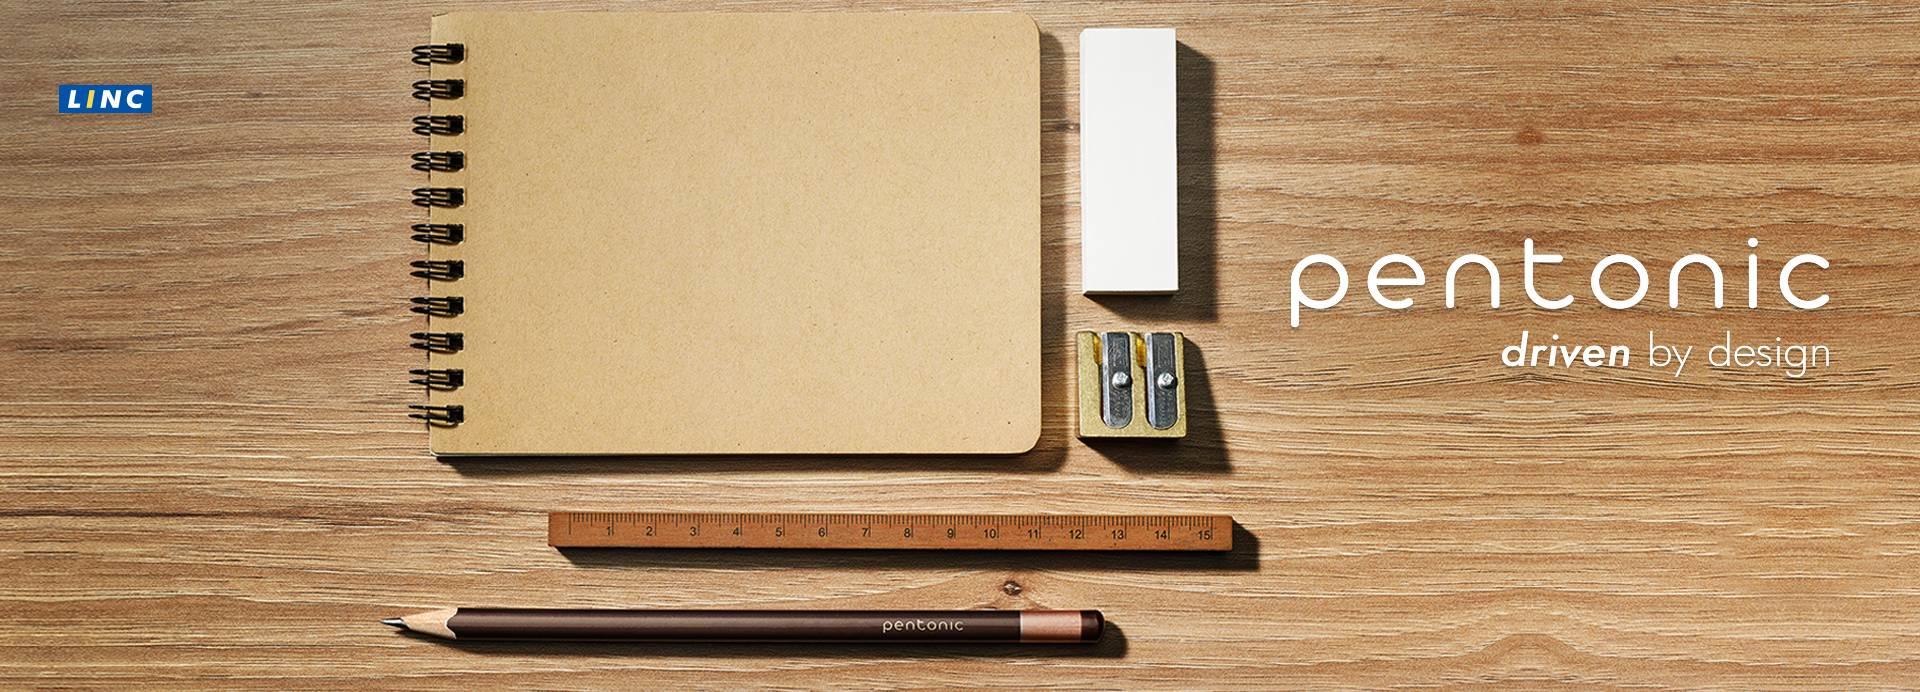 linc pentonic pencil